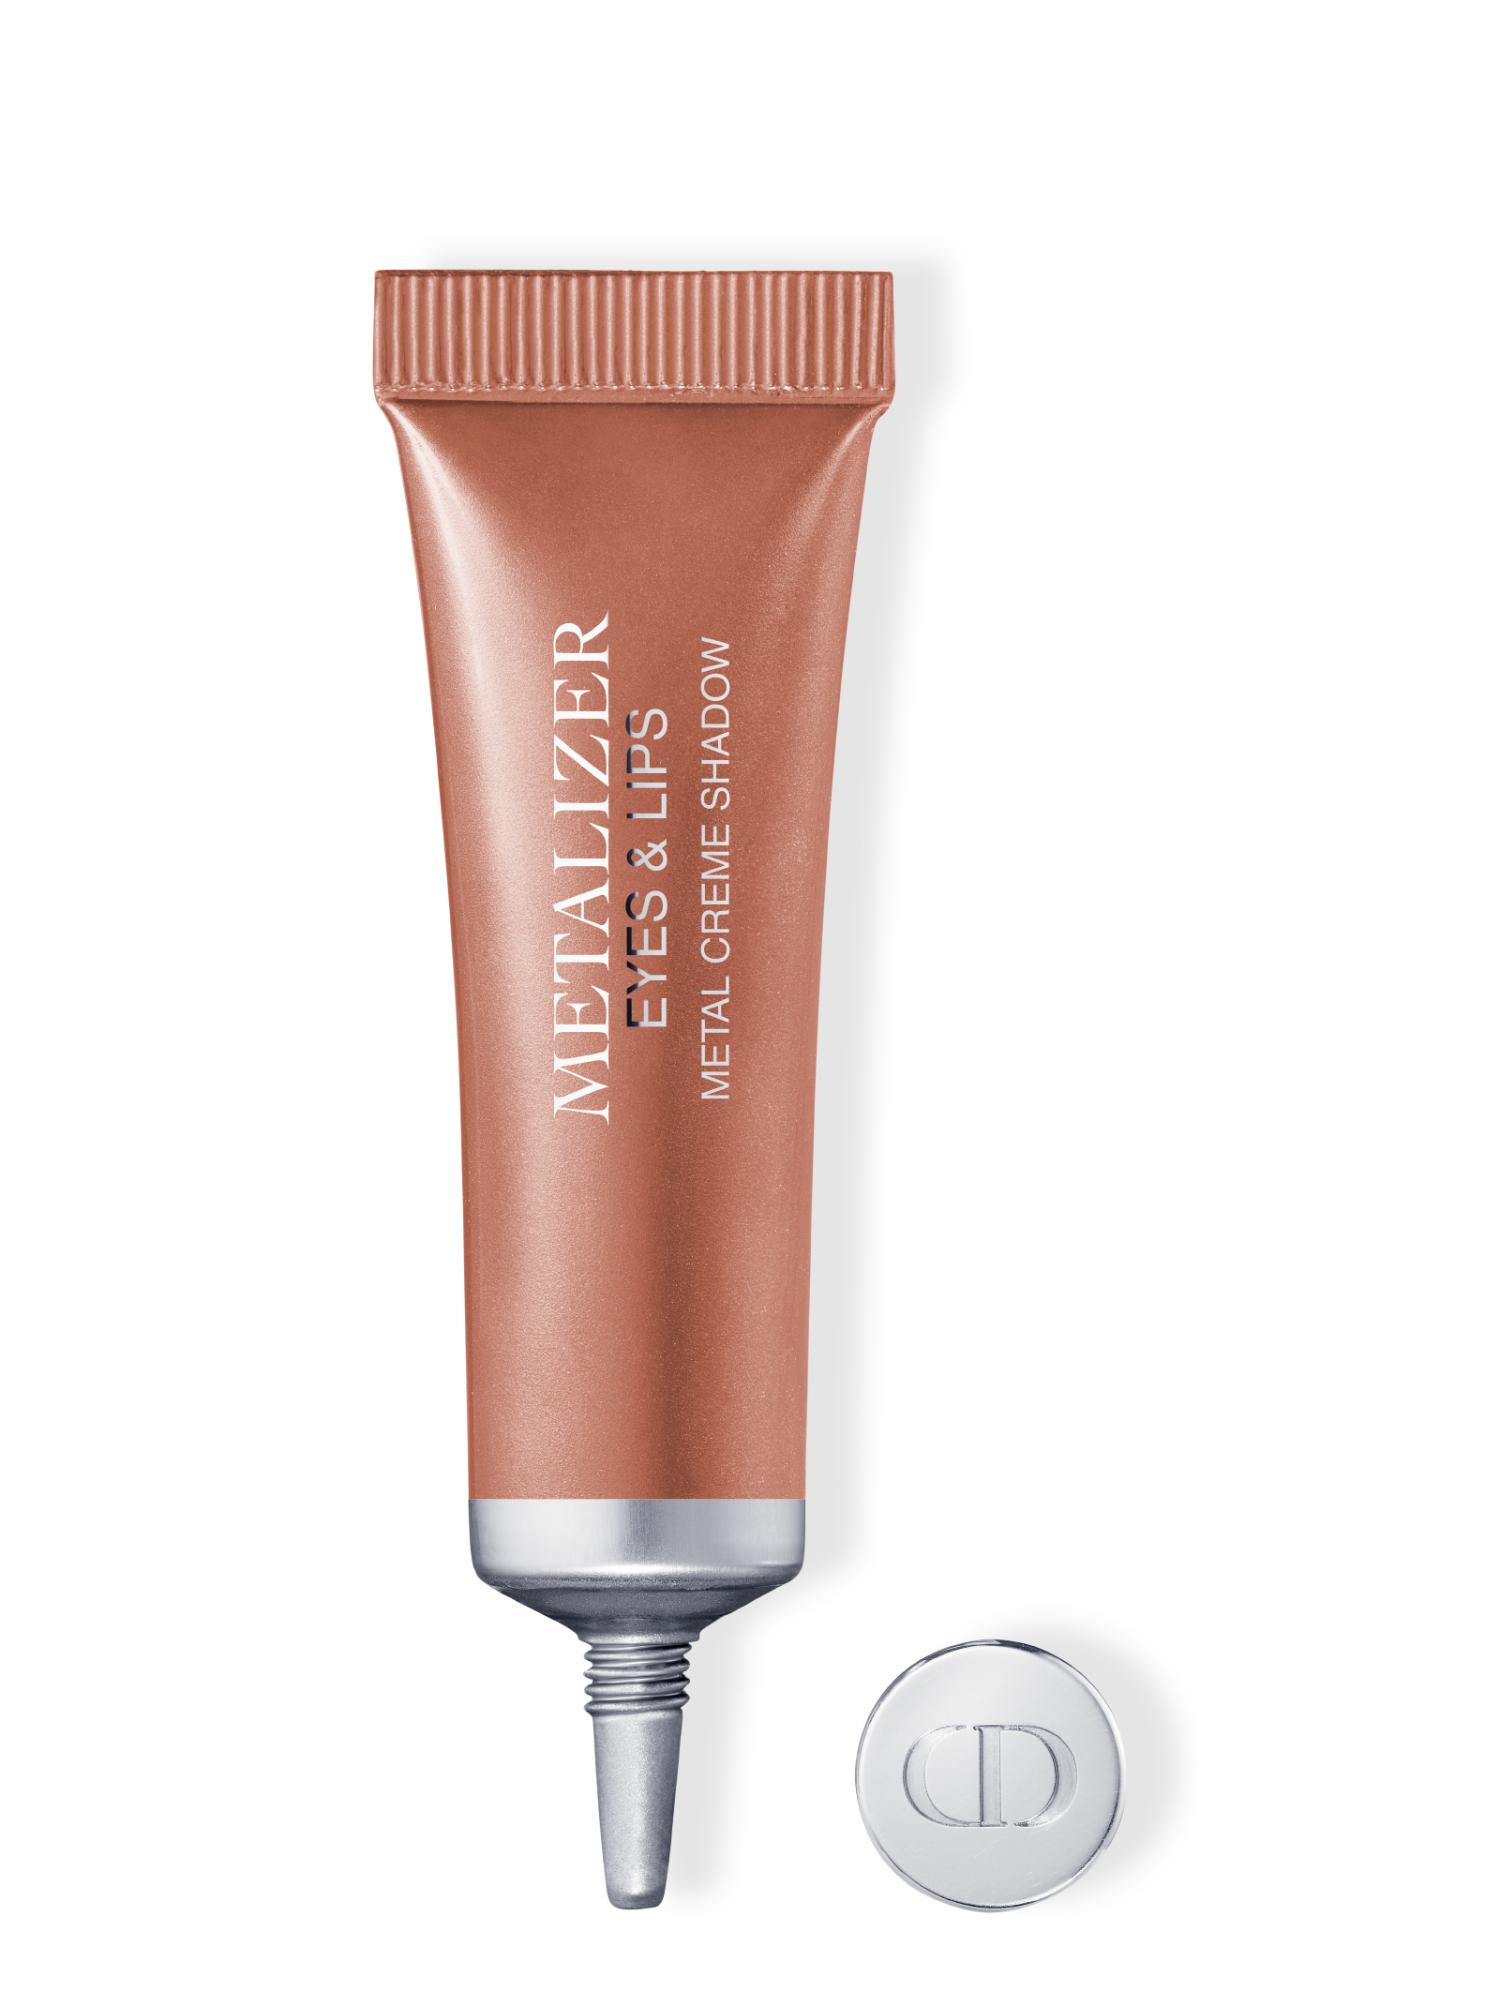 Diorshow Color Metalizer Eyeshadow 548 Copper Power